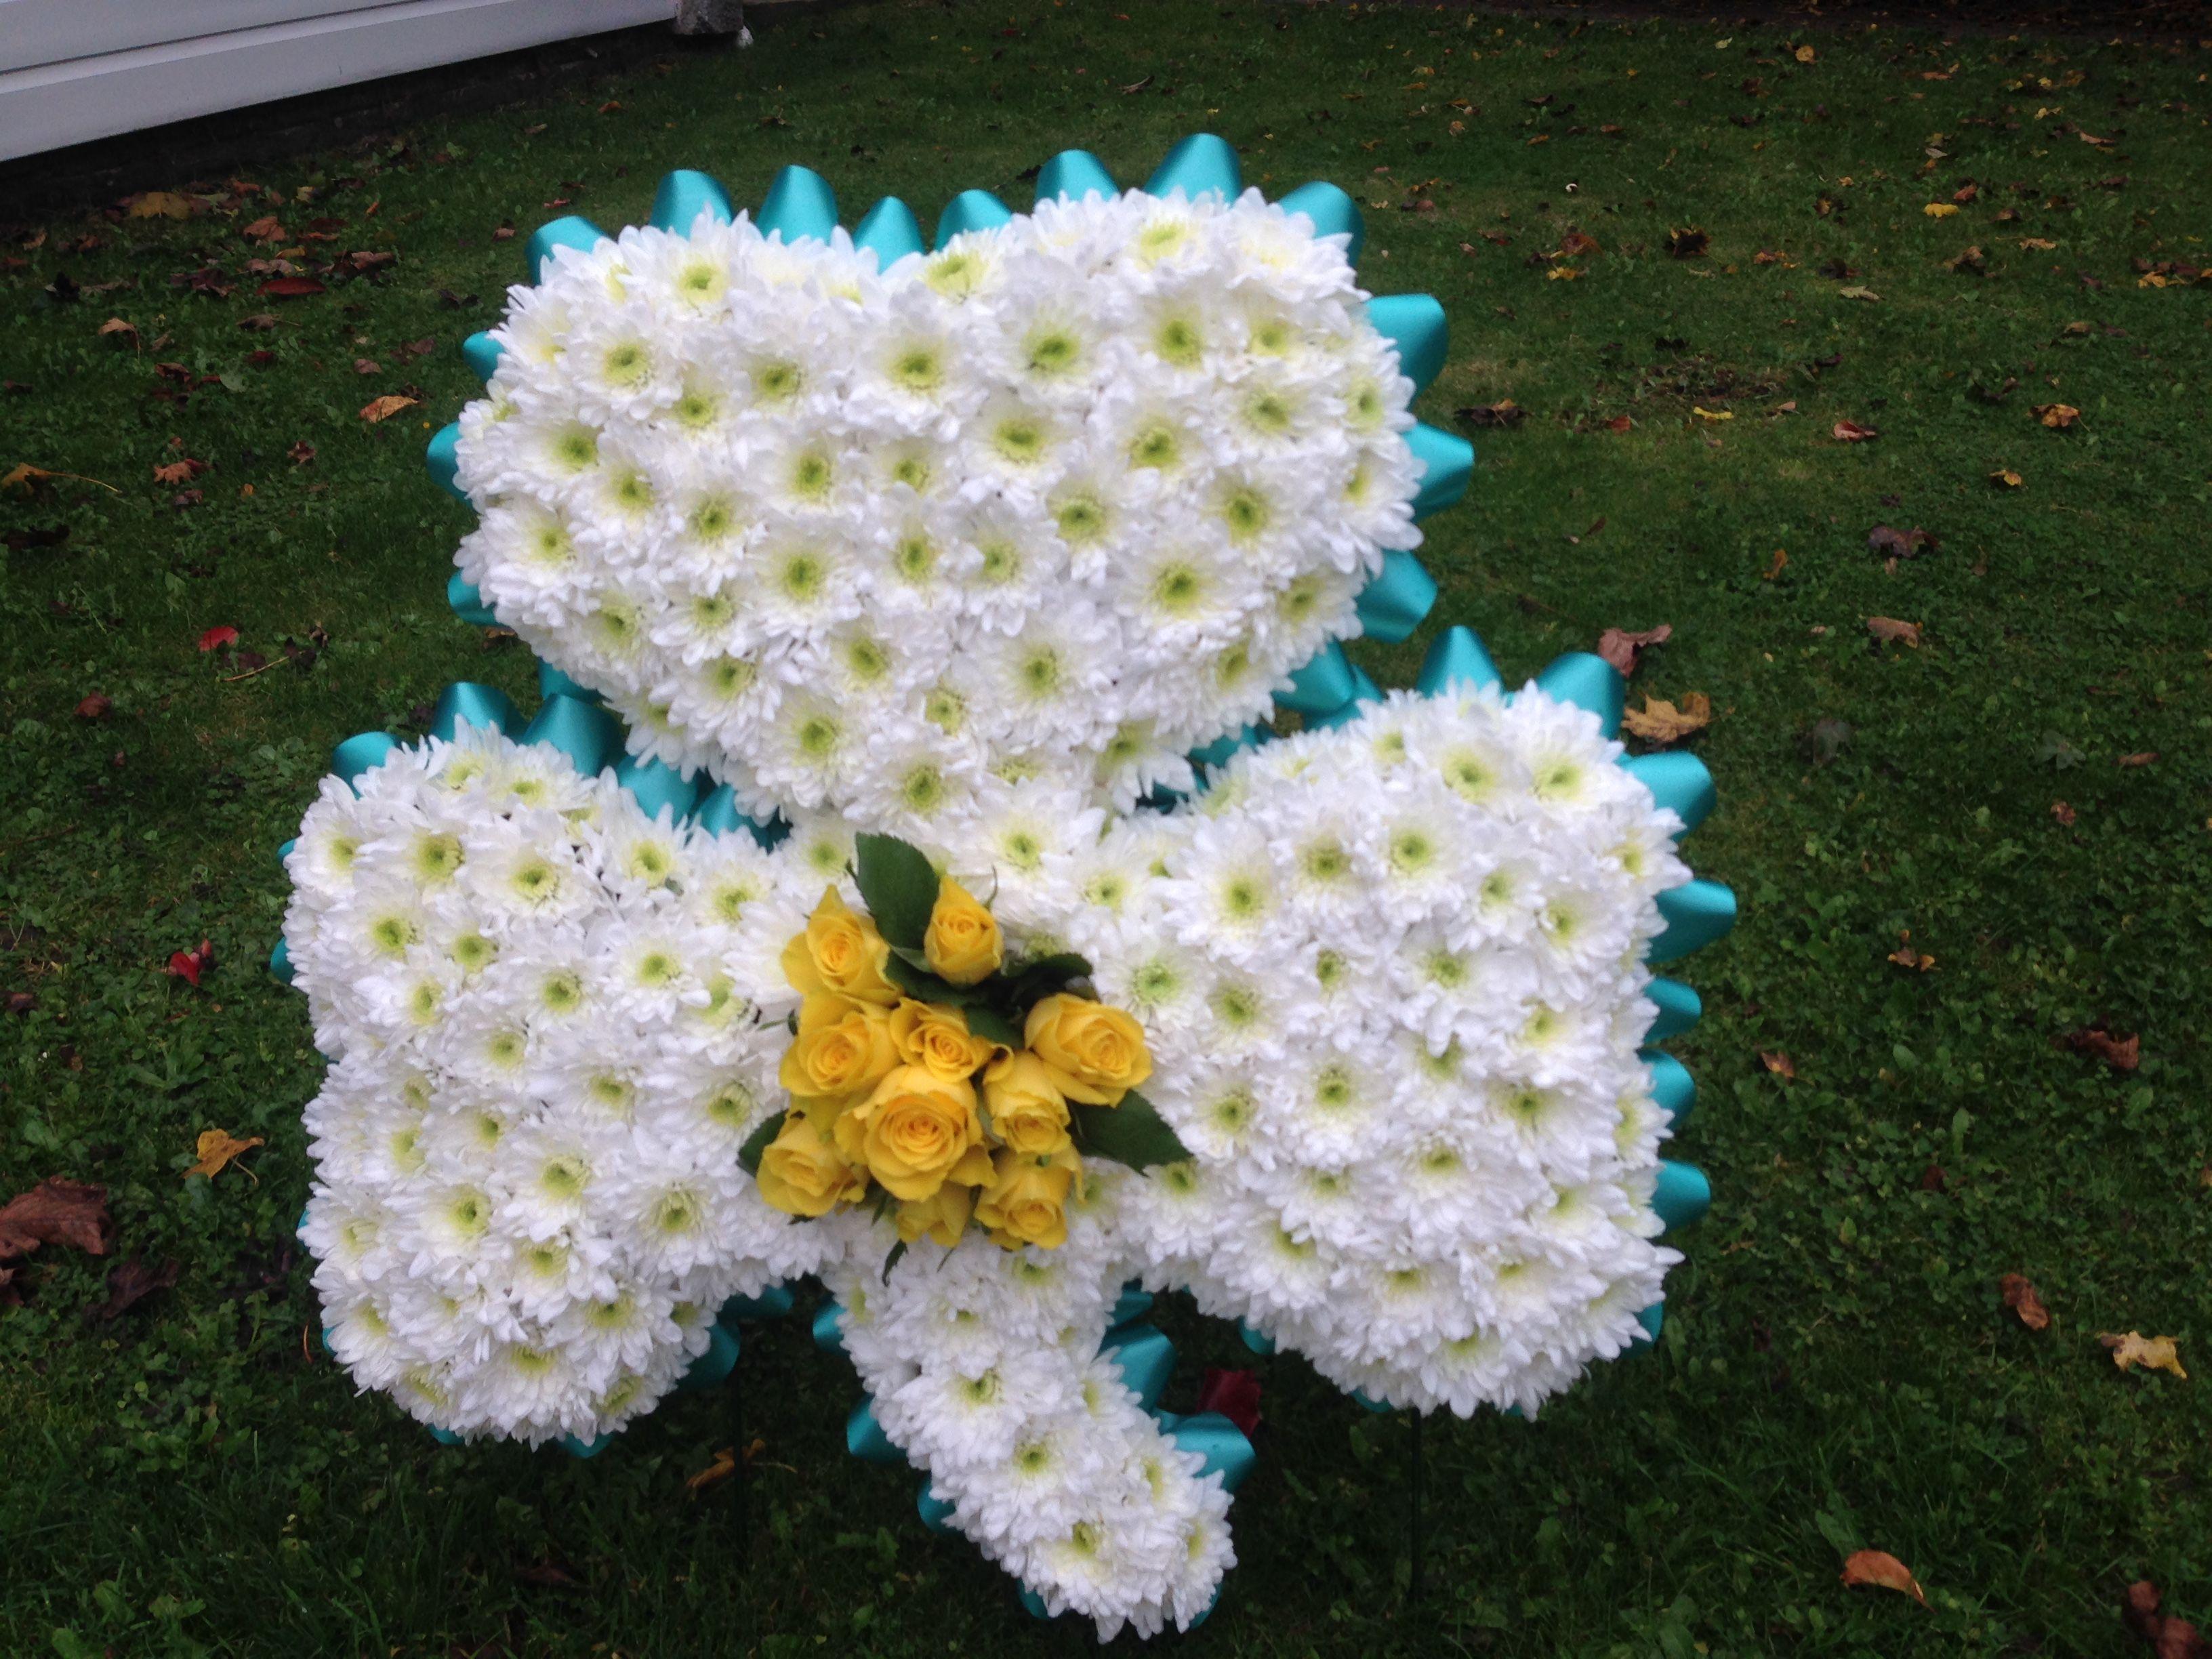 Shamrock flower tribute westwood flowers sympathy funeral shamrock flower tribute izmirmasajfo